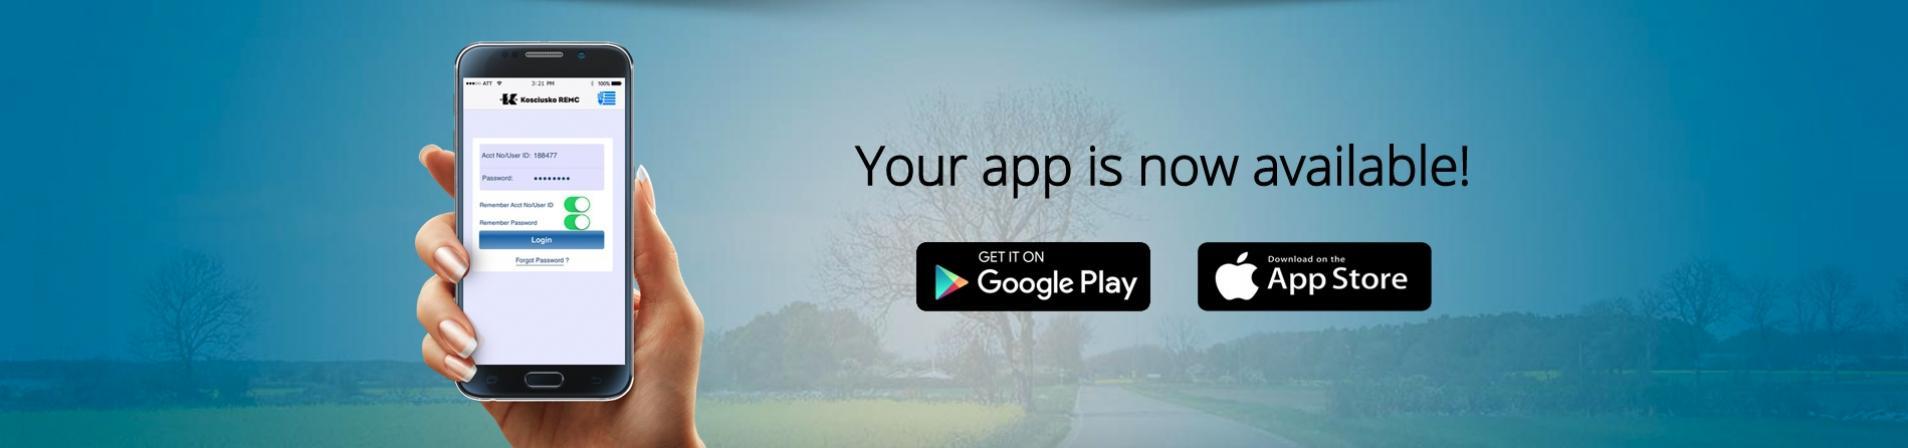 https://kremc.com/sites/default/files/images/mobile_apps.jpg